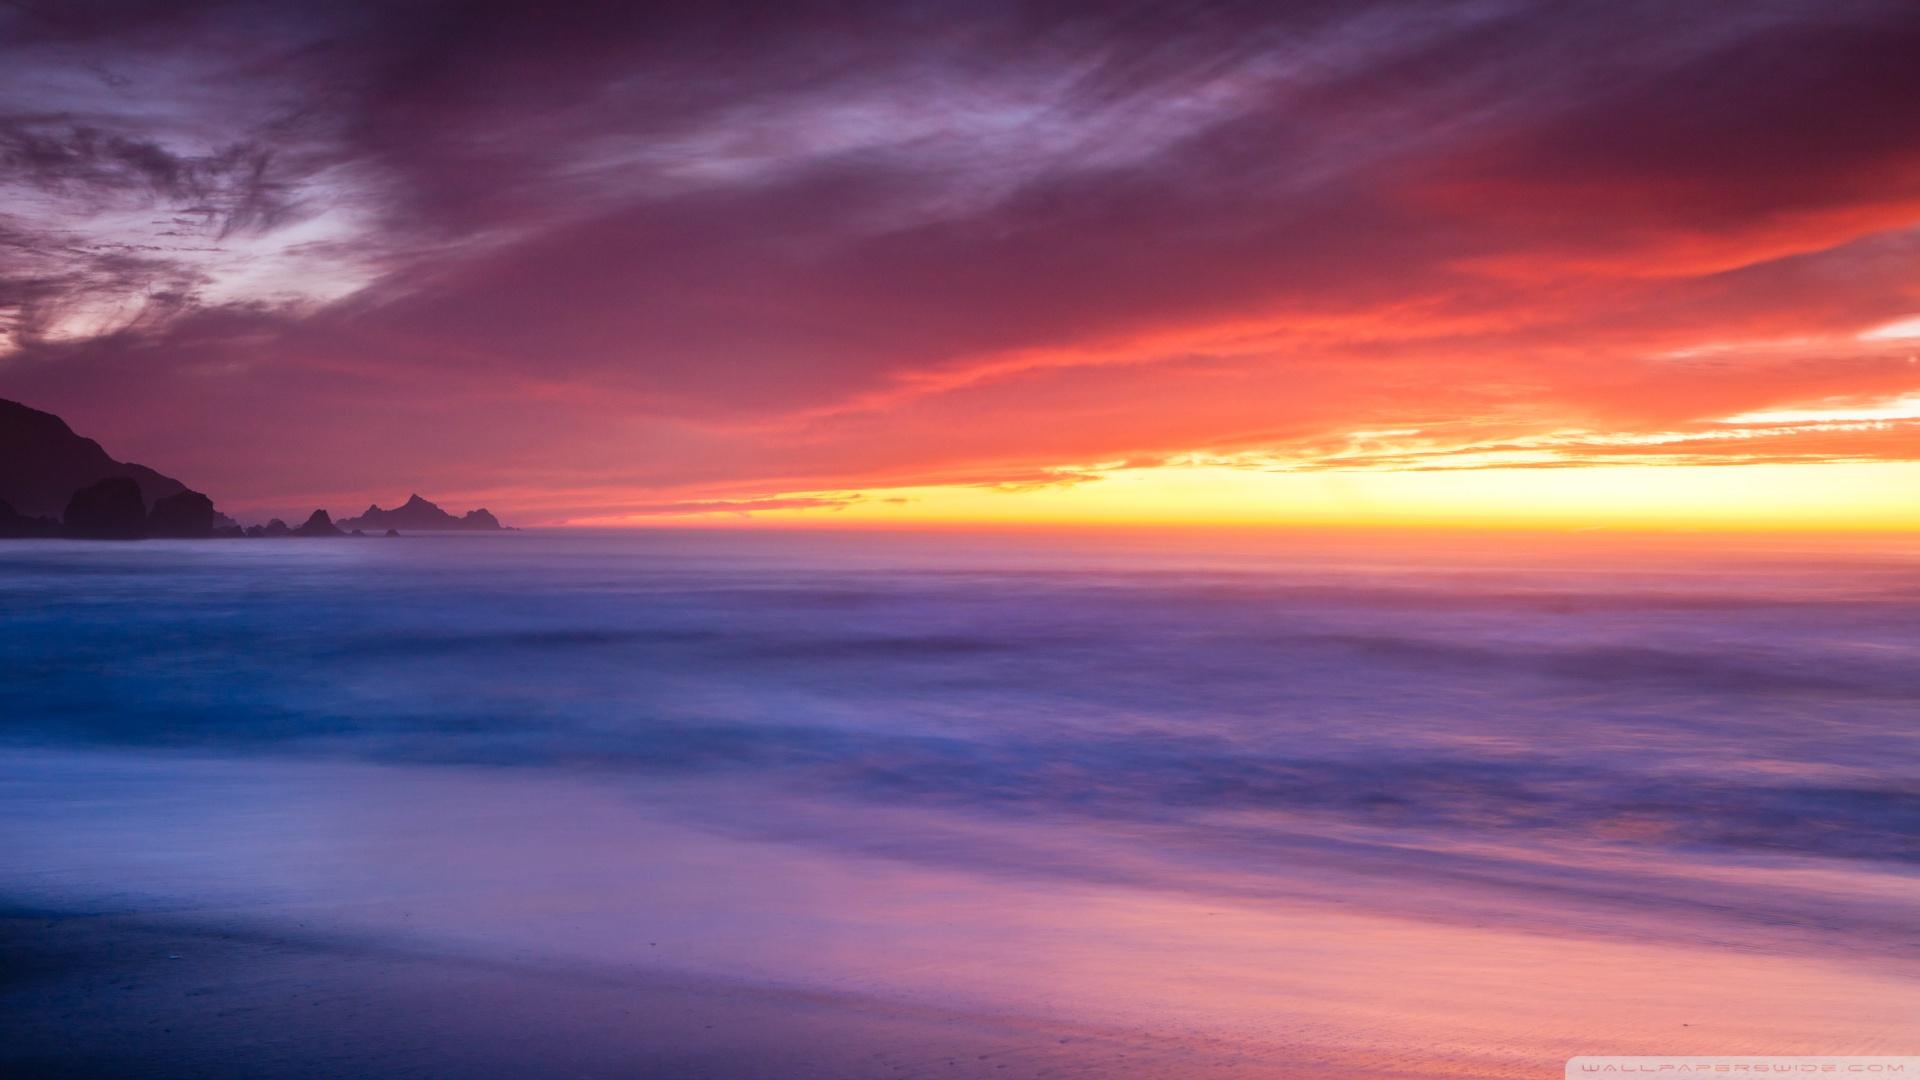 California Beaches Wallpaper Rockaway beach california 1920x1080